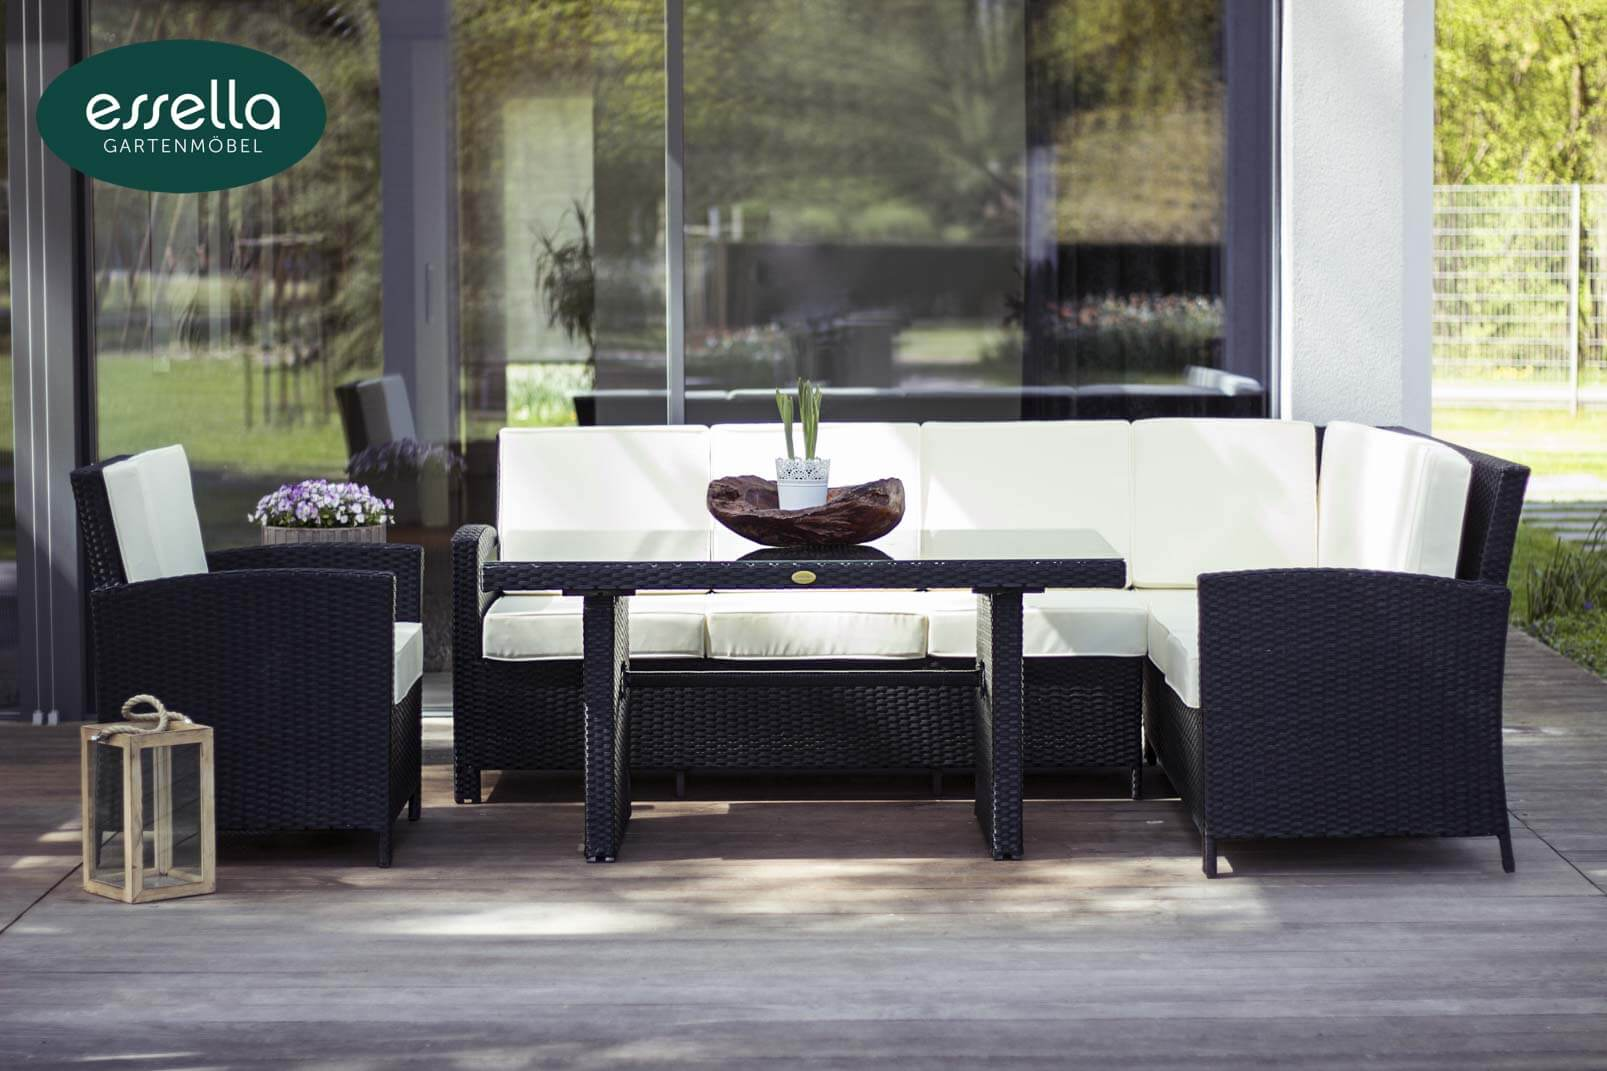 essgruppe 8 personen essgruppe valerana f r 8 personen essgruppe f r 8 personen aus kernbuche. Black Bedroom Furniture Sets. Home Design Ideas